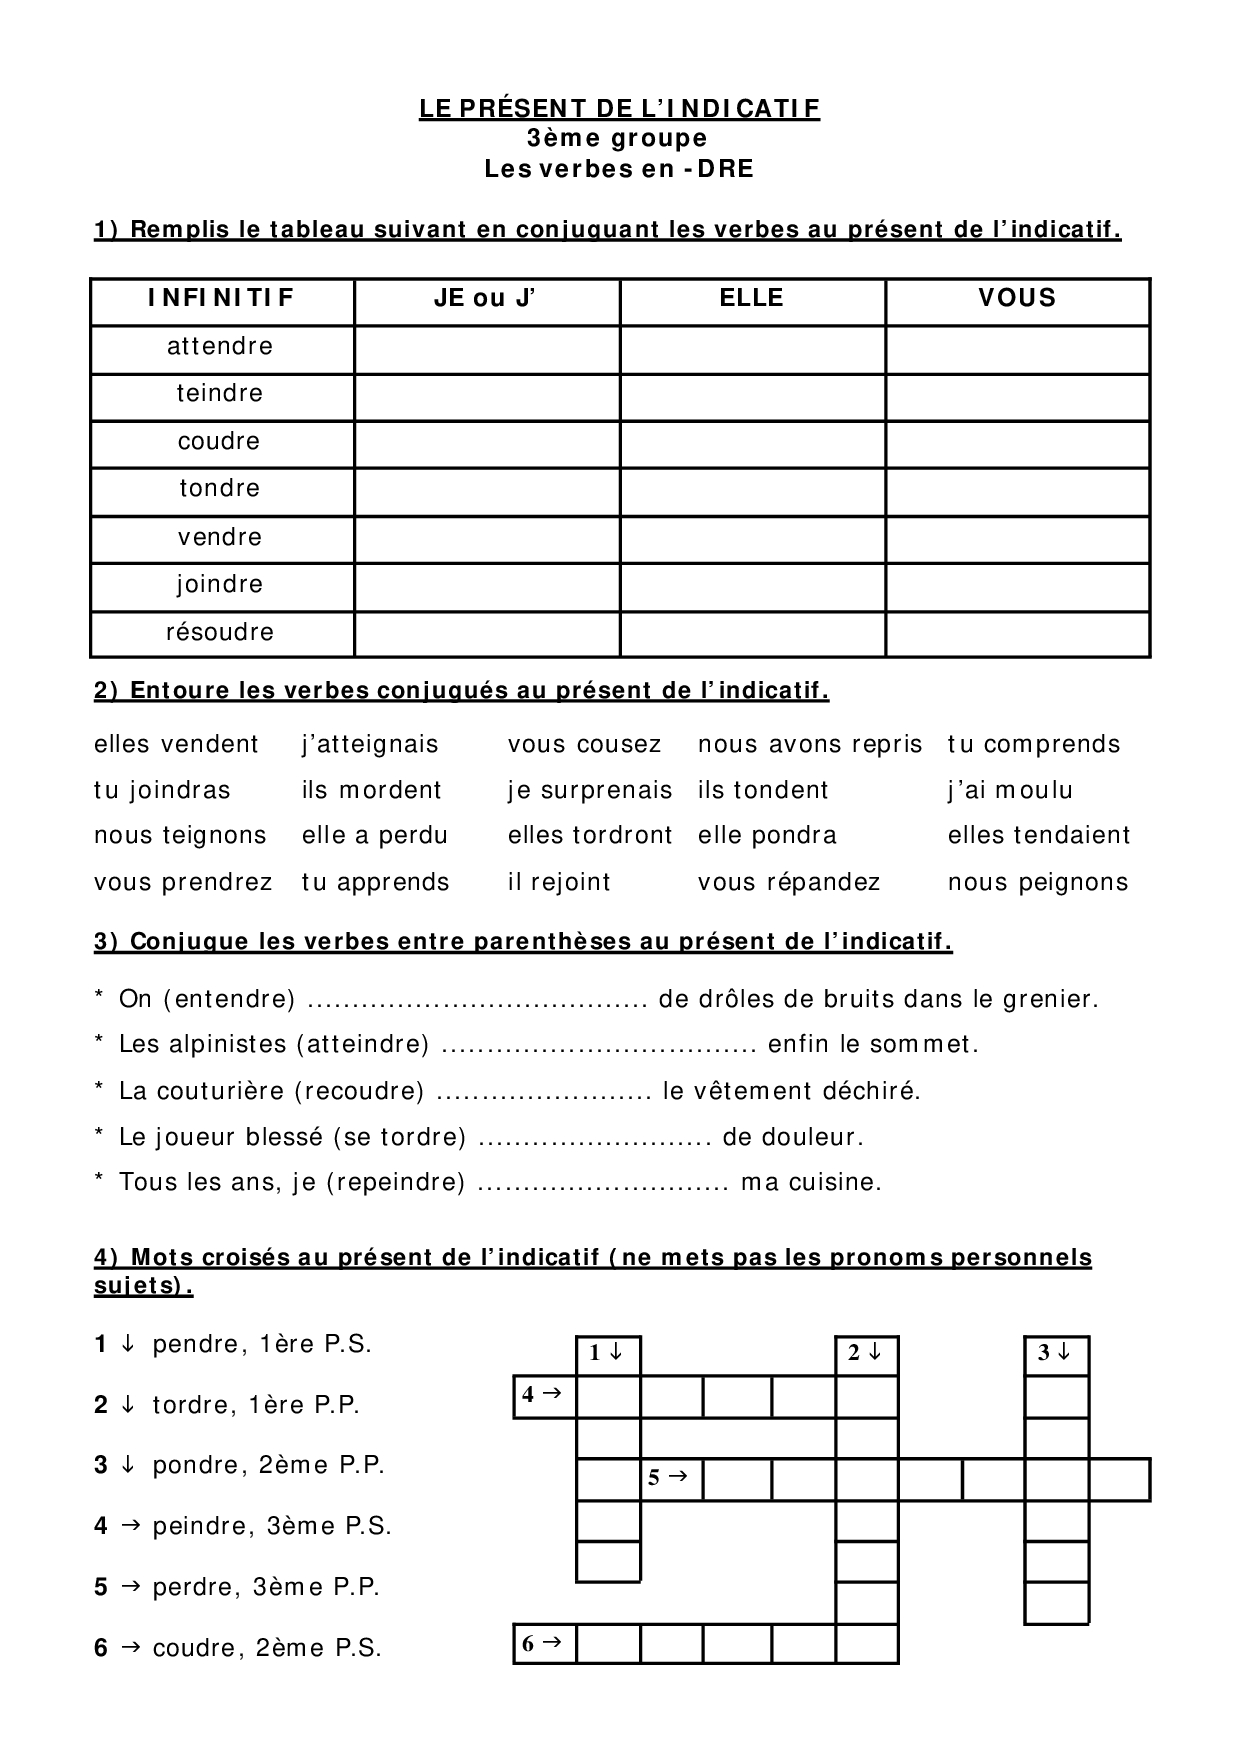 Le Present De L Indicatif Le 3eme Groupe Exercices 3 Alloschool